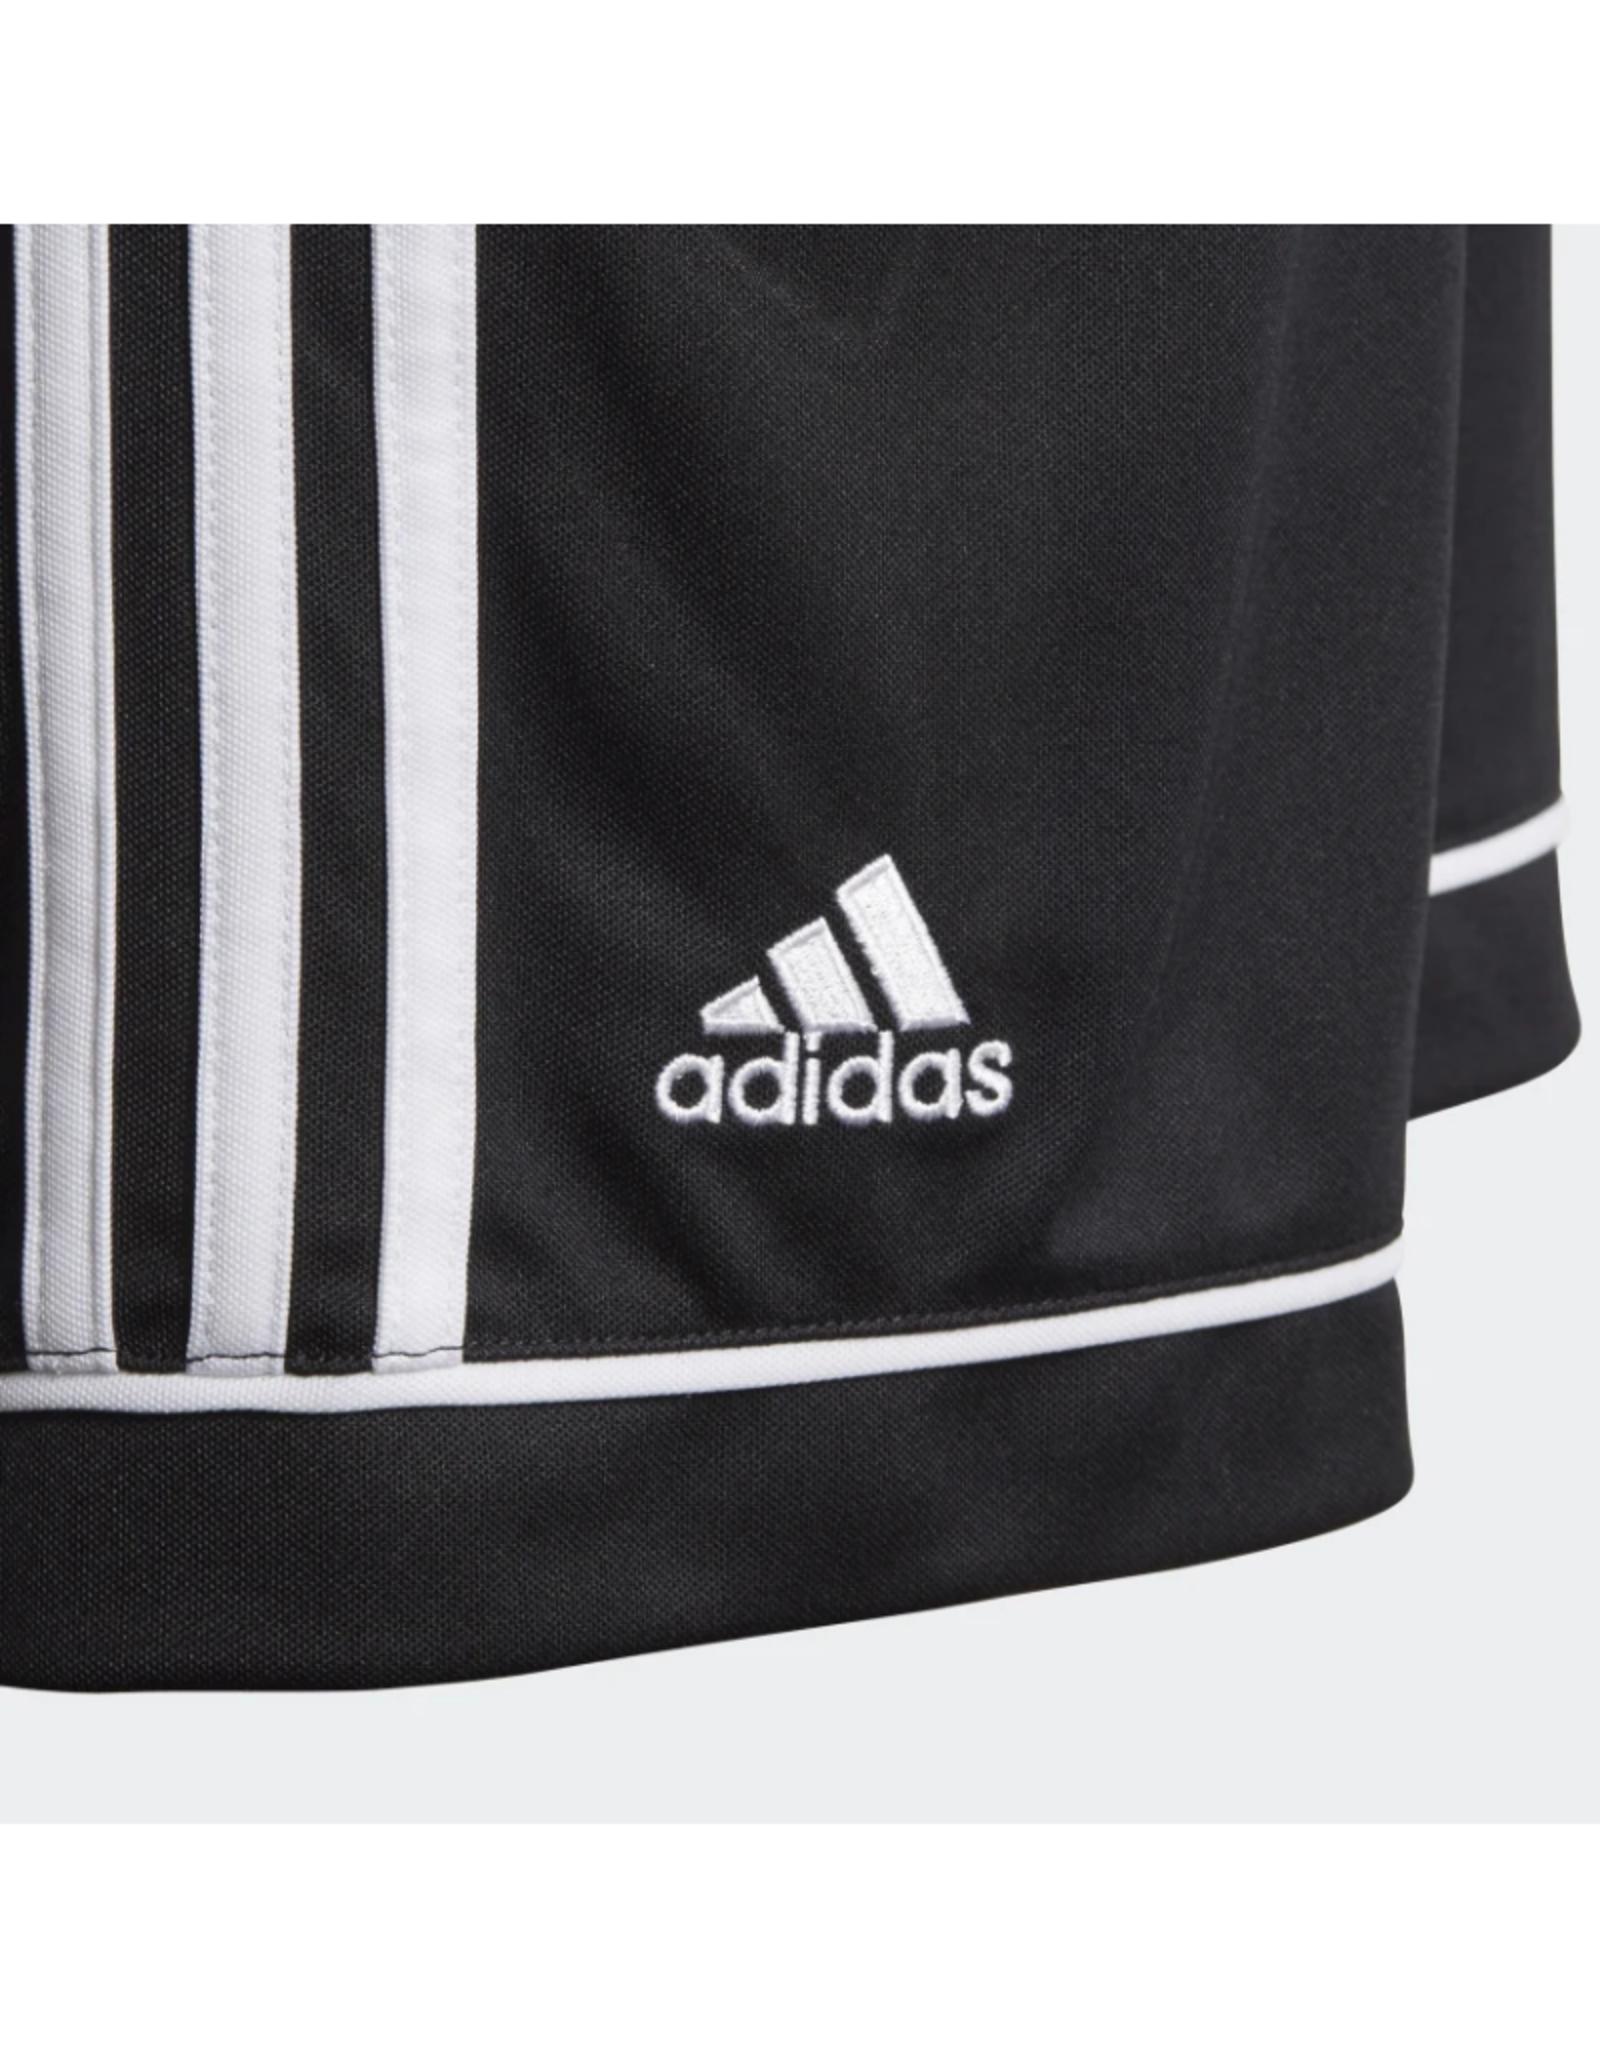 Adidas Adidas Youth Squad 17 Soccer Short